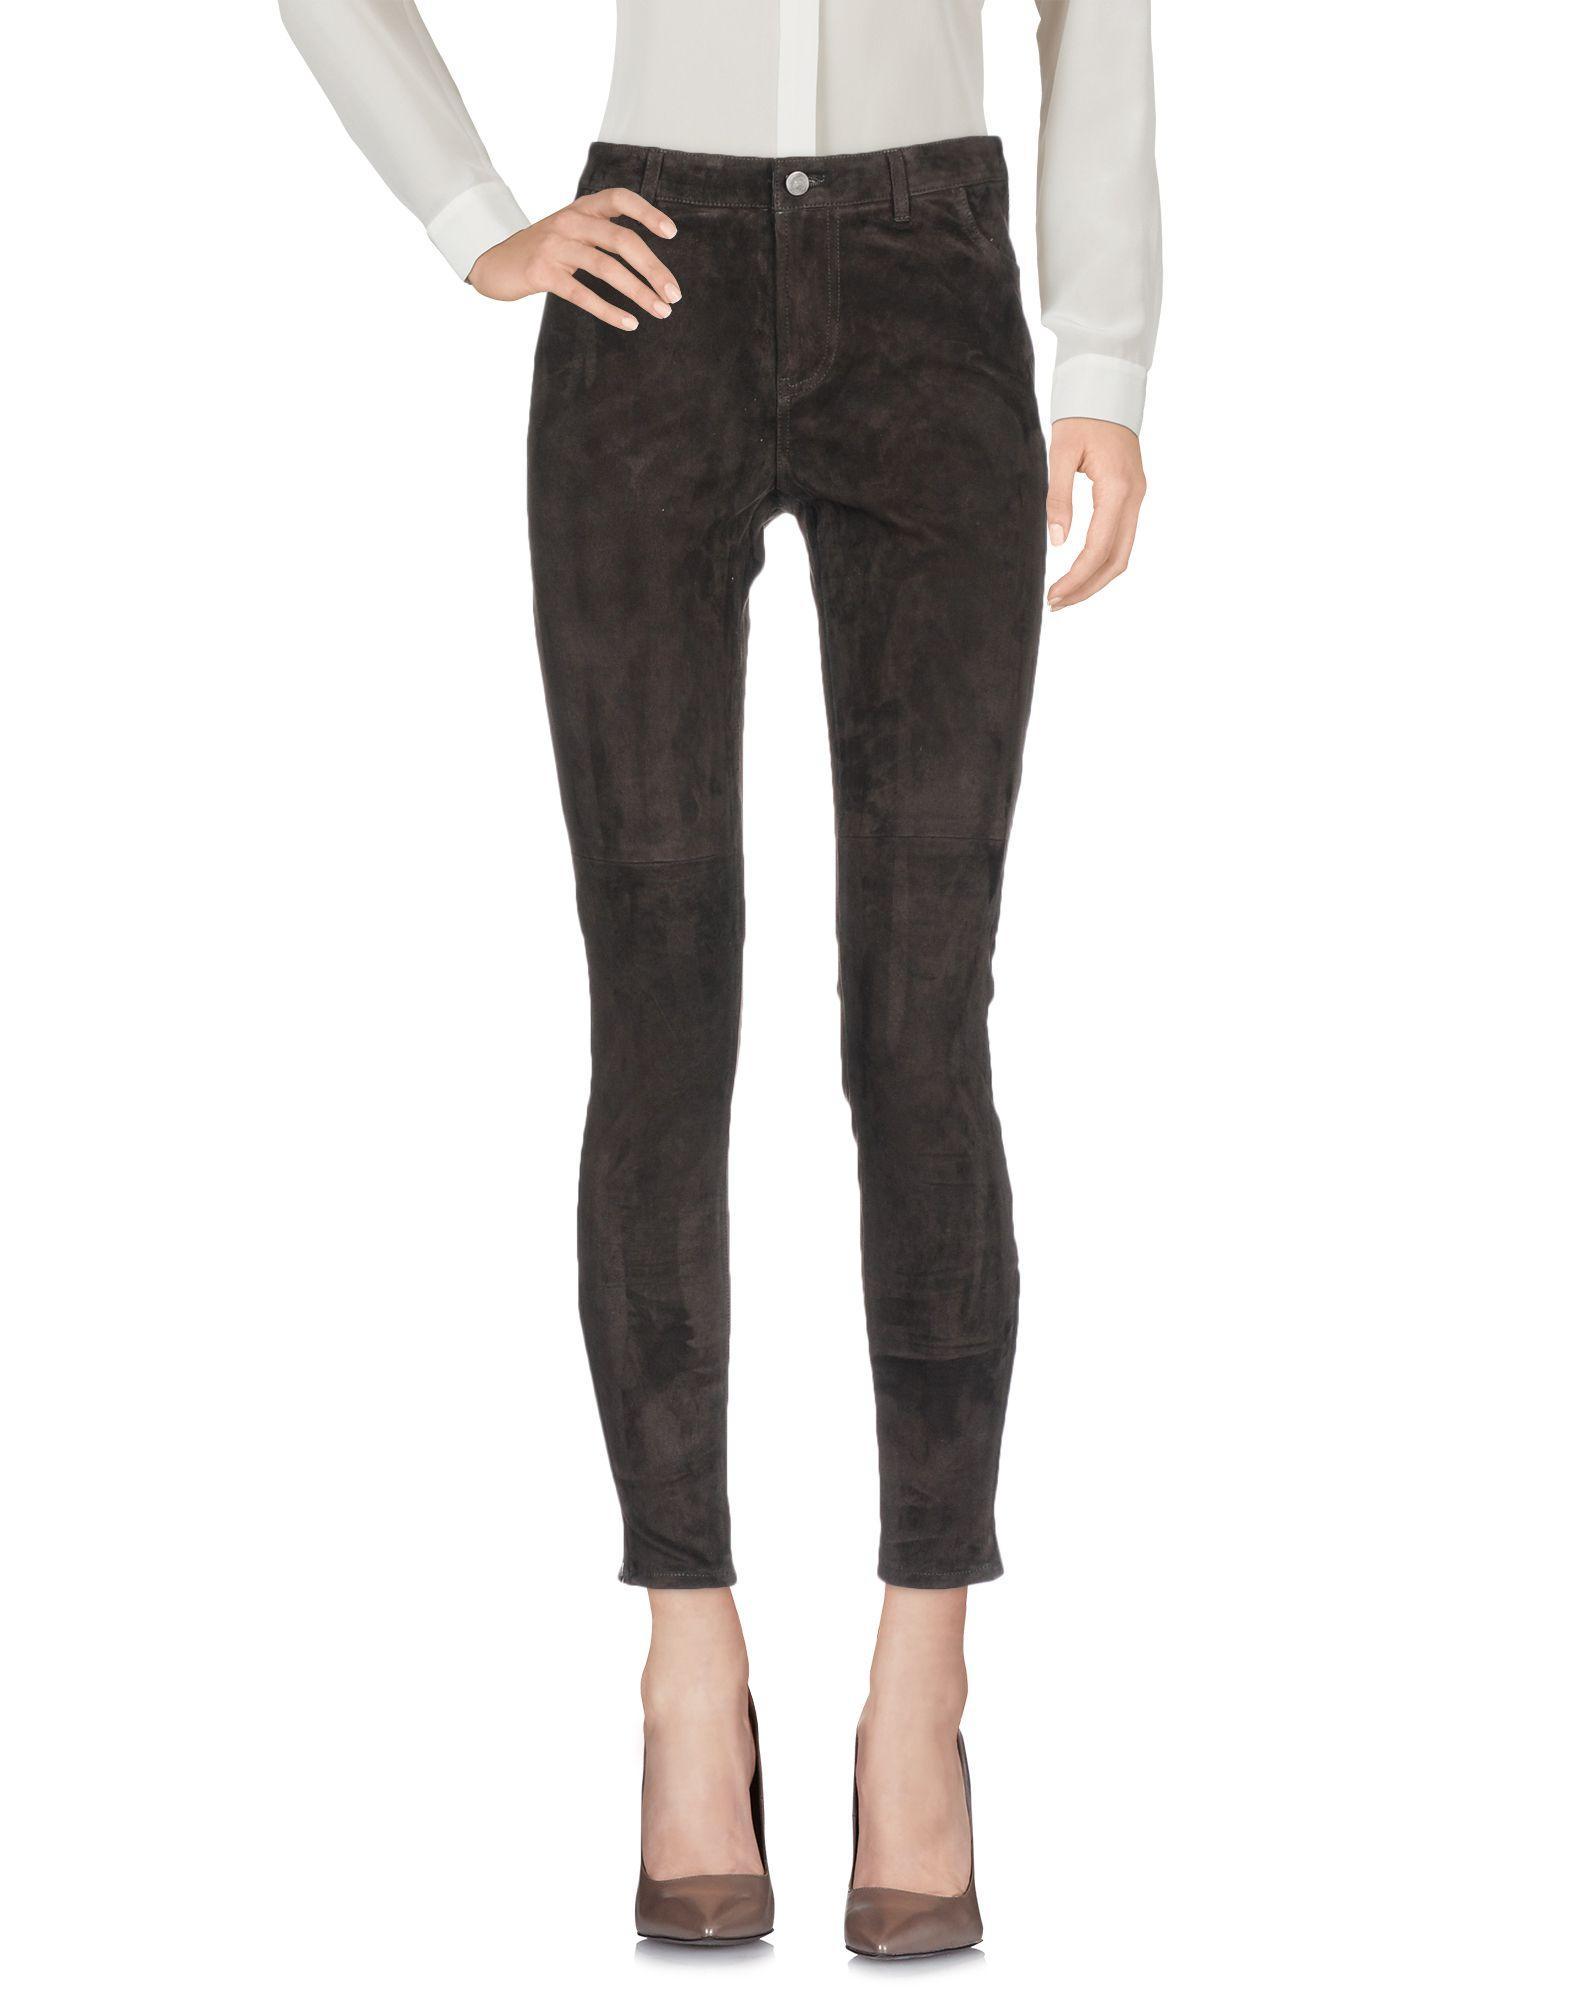 Rebecca Minkoff Casual Pants In Dark Brown